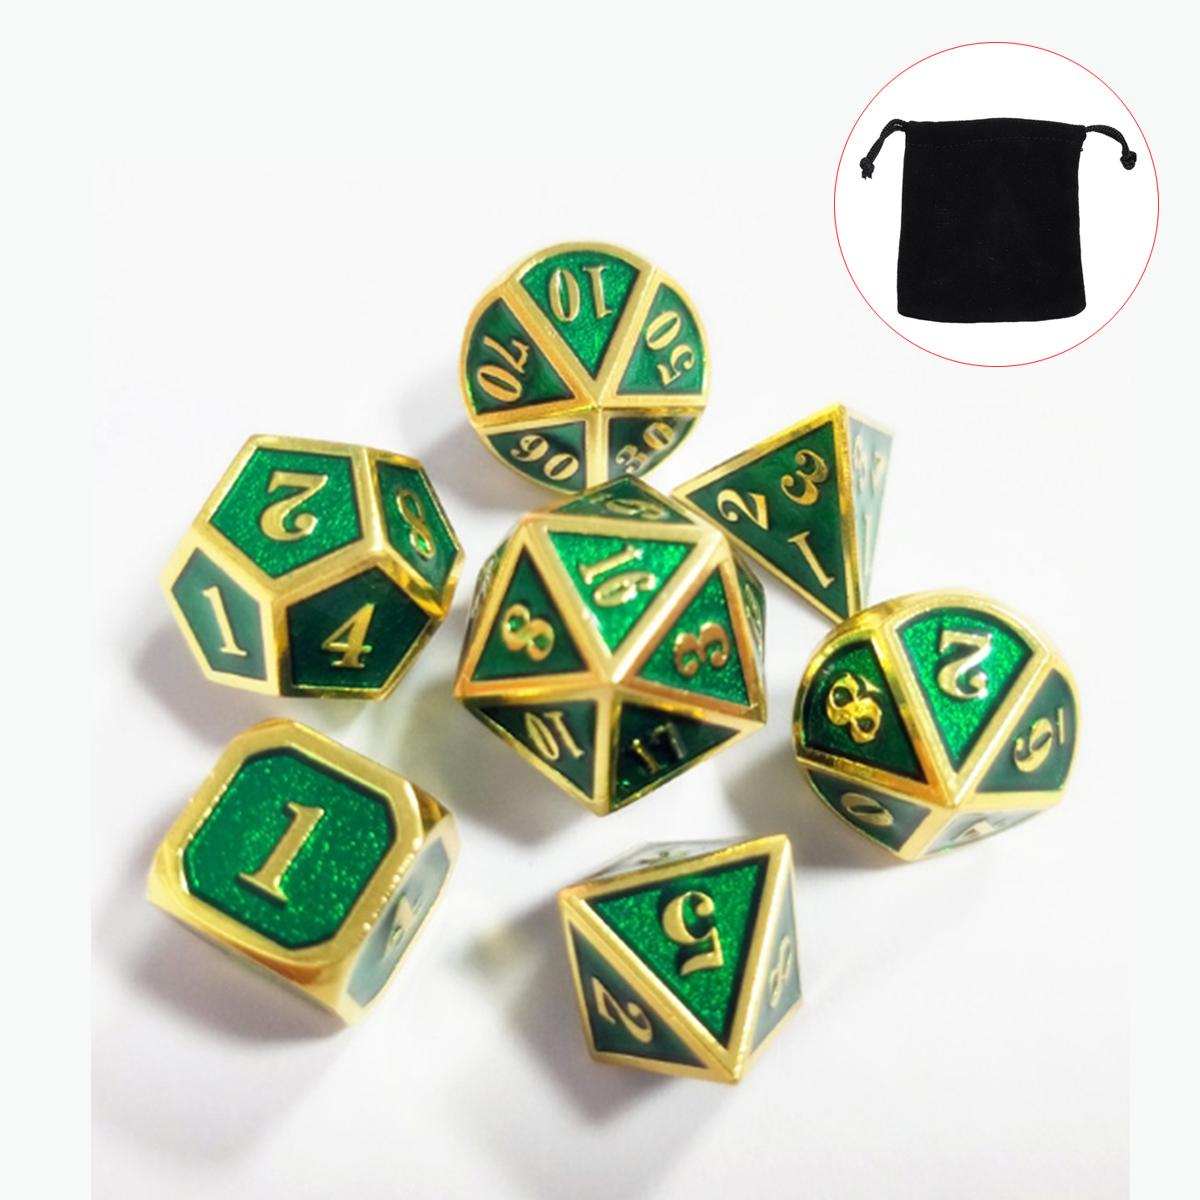 7pcs-Polyhedral-Knobel-Wuerfel-Spielwuerfel-fuer-MTG-DND-RPG-Game-Dice-Multi-Sides Indexbild 15